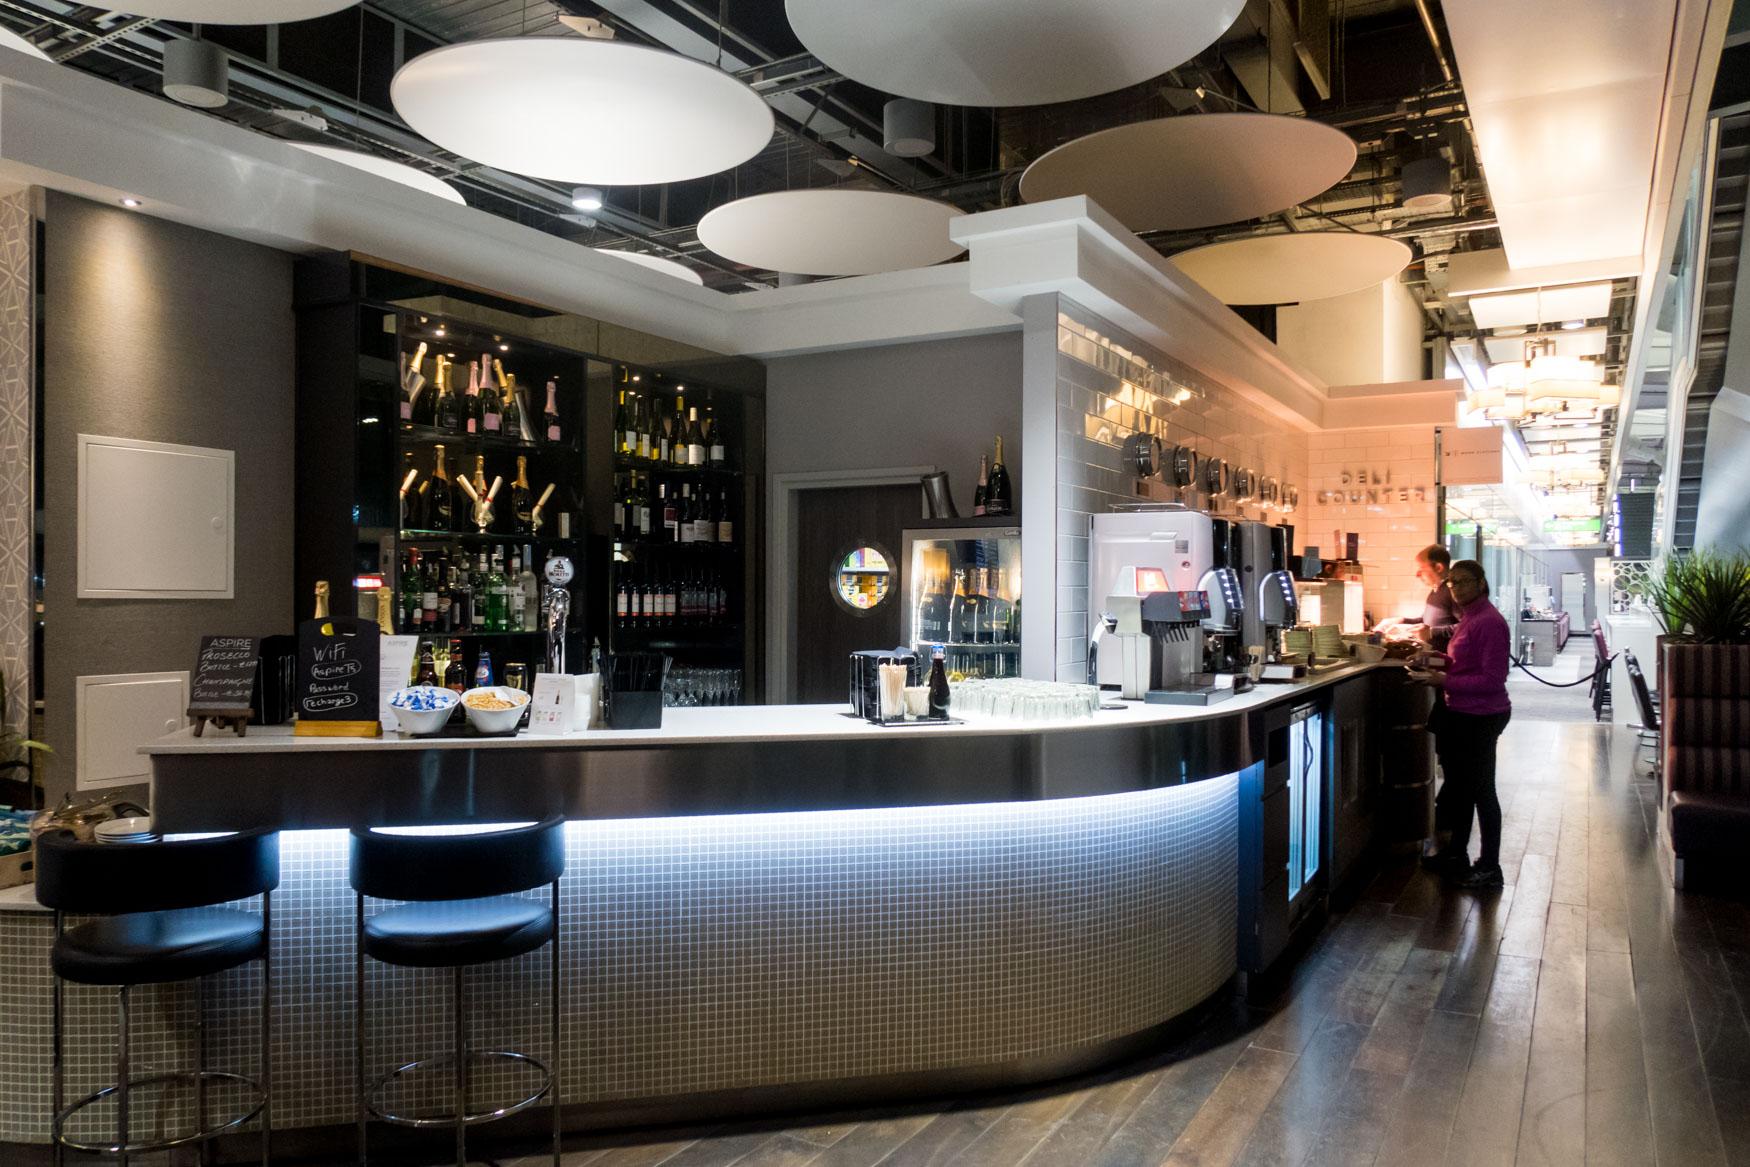 Aspire The Lounge and Spa London Heathrow Bar